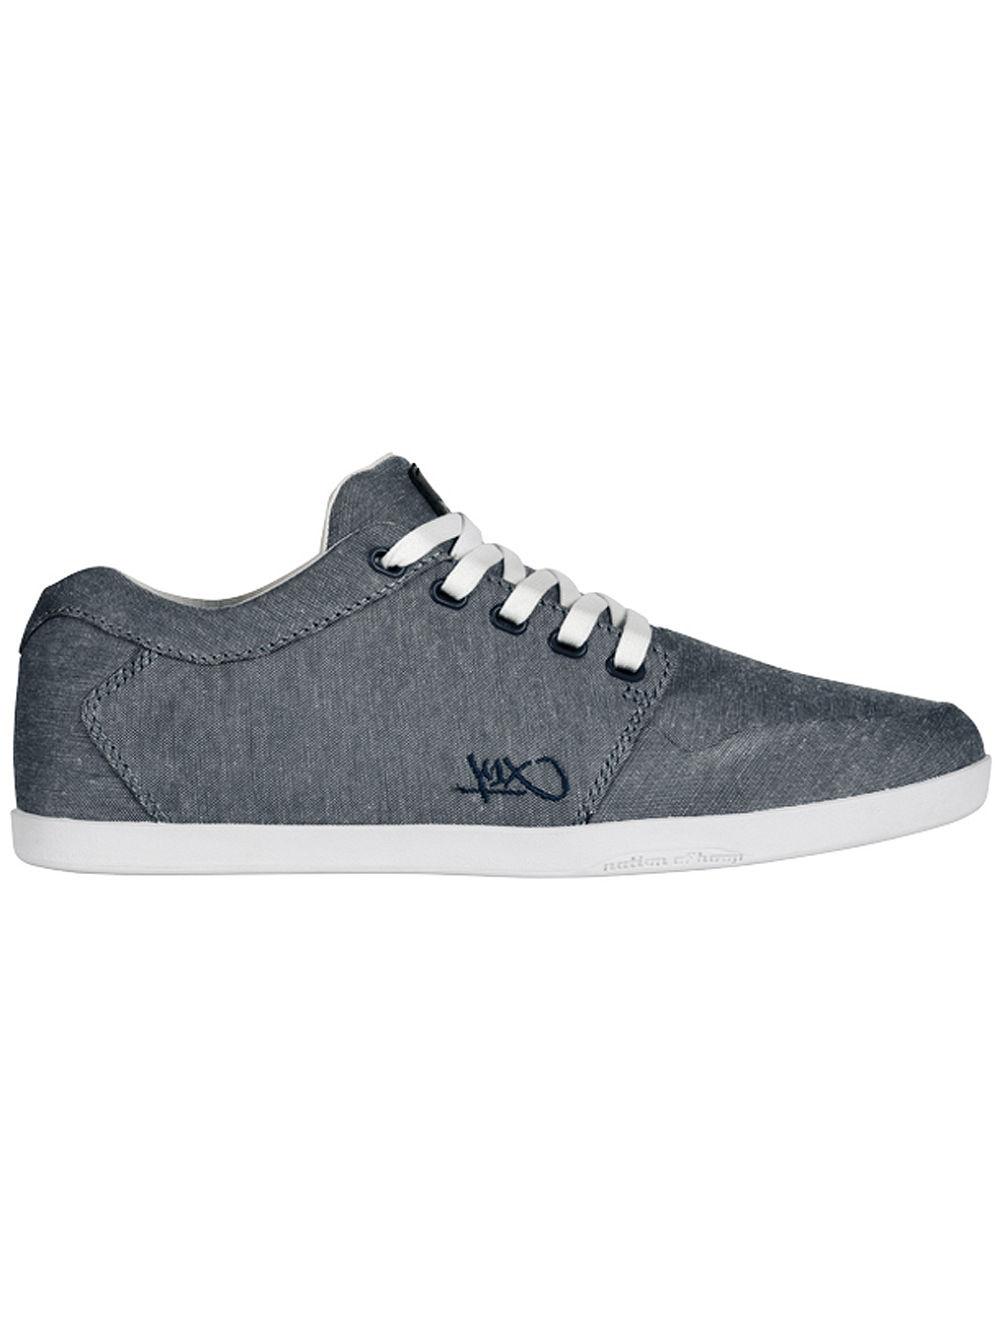 k1x-lp-low-sneakers